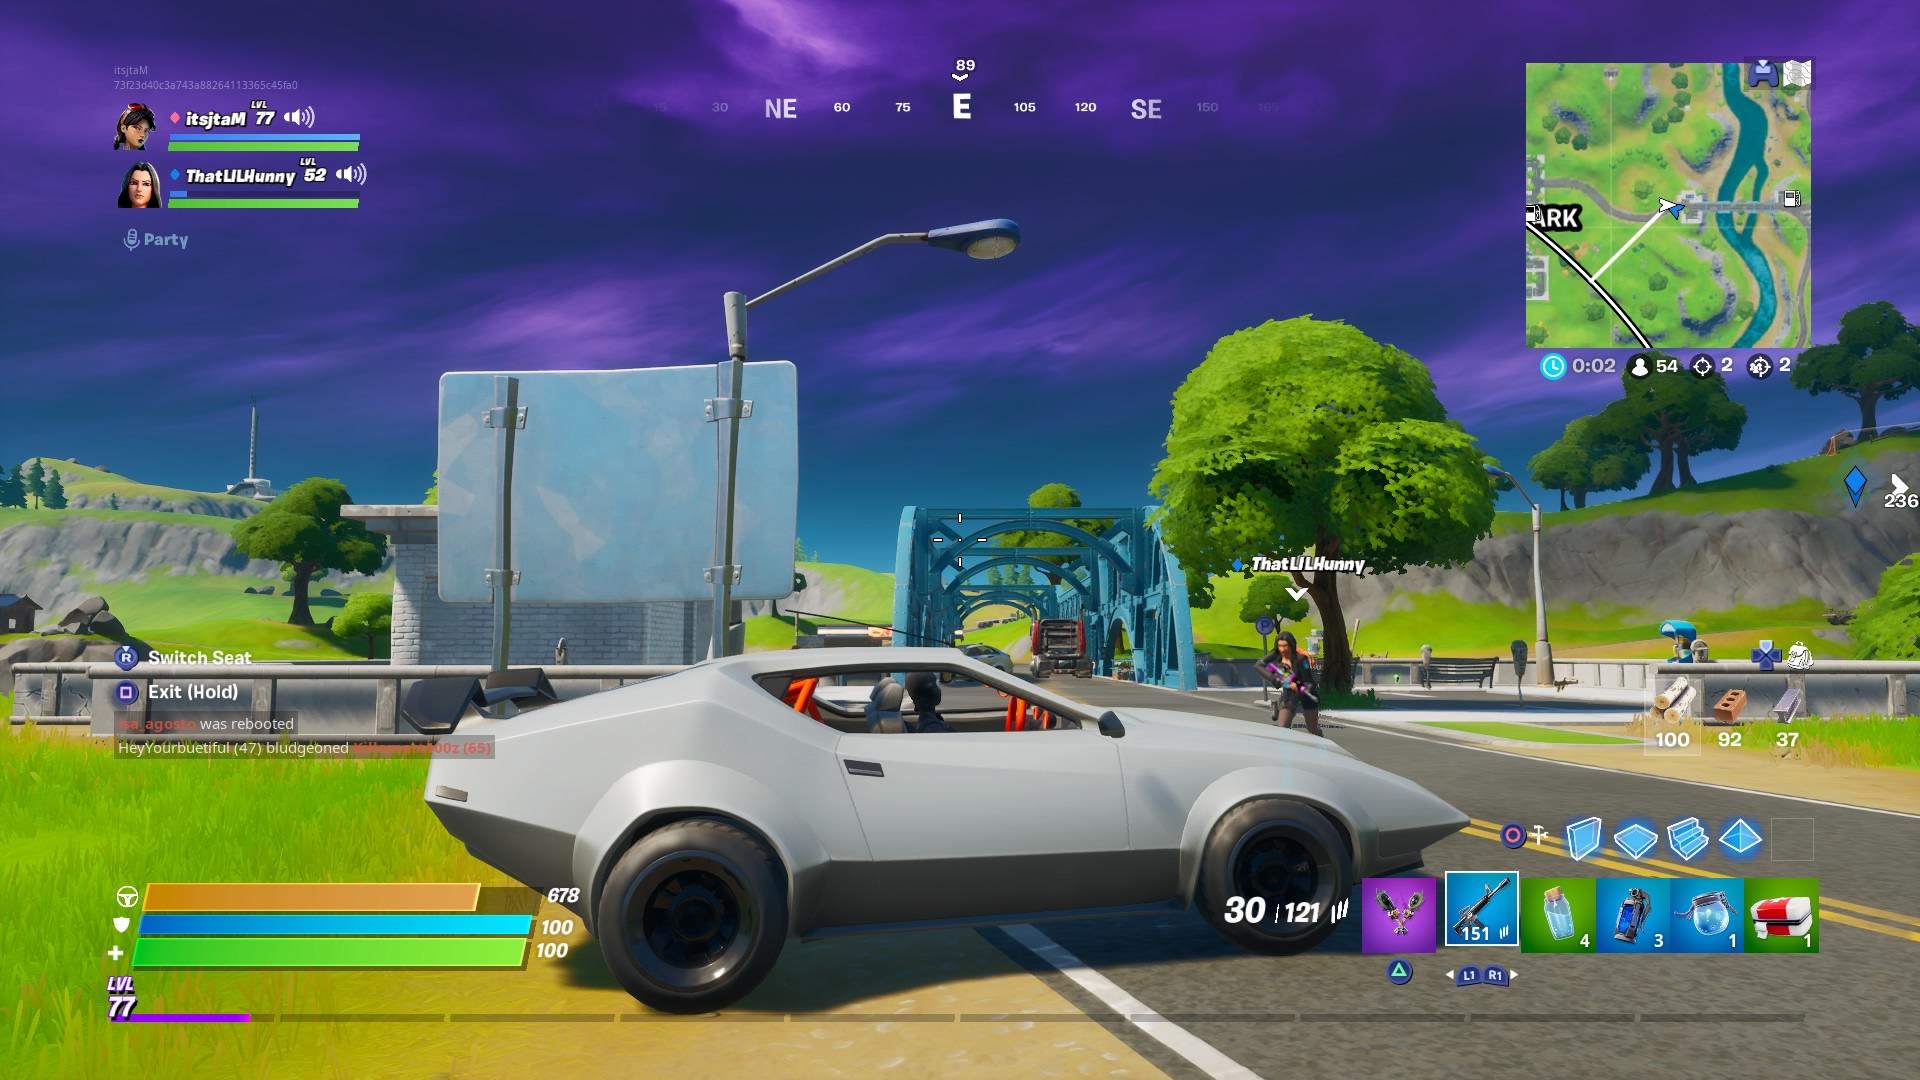 fortnite fast car hd wallpaper 71492